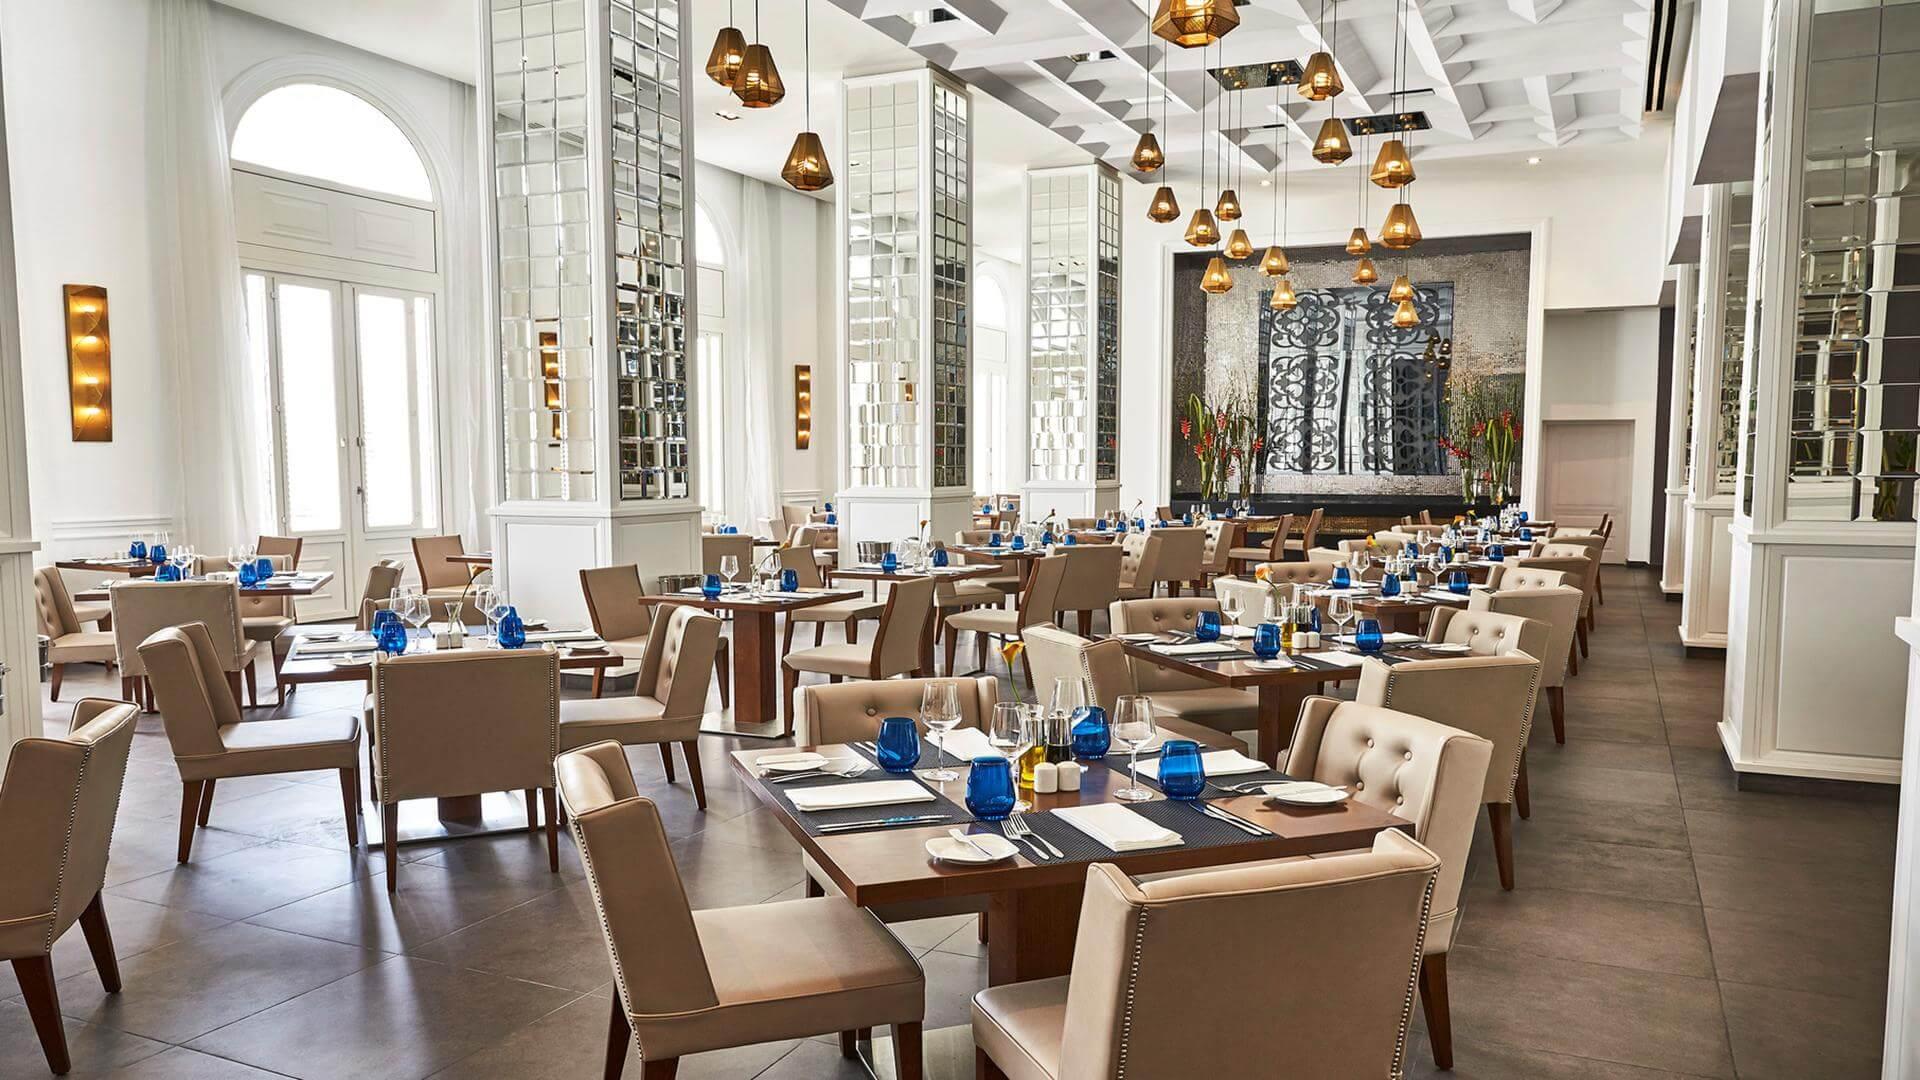 Gran Hotel Manzana Kempinzki la Habana Restaurant